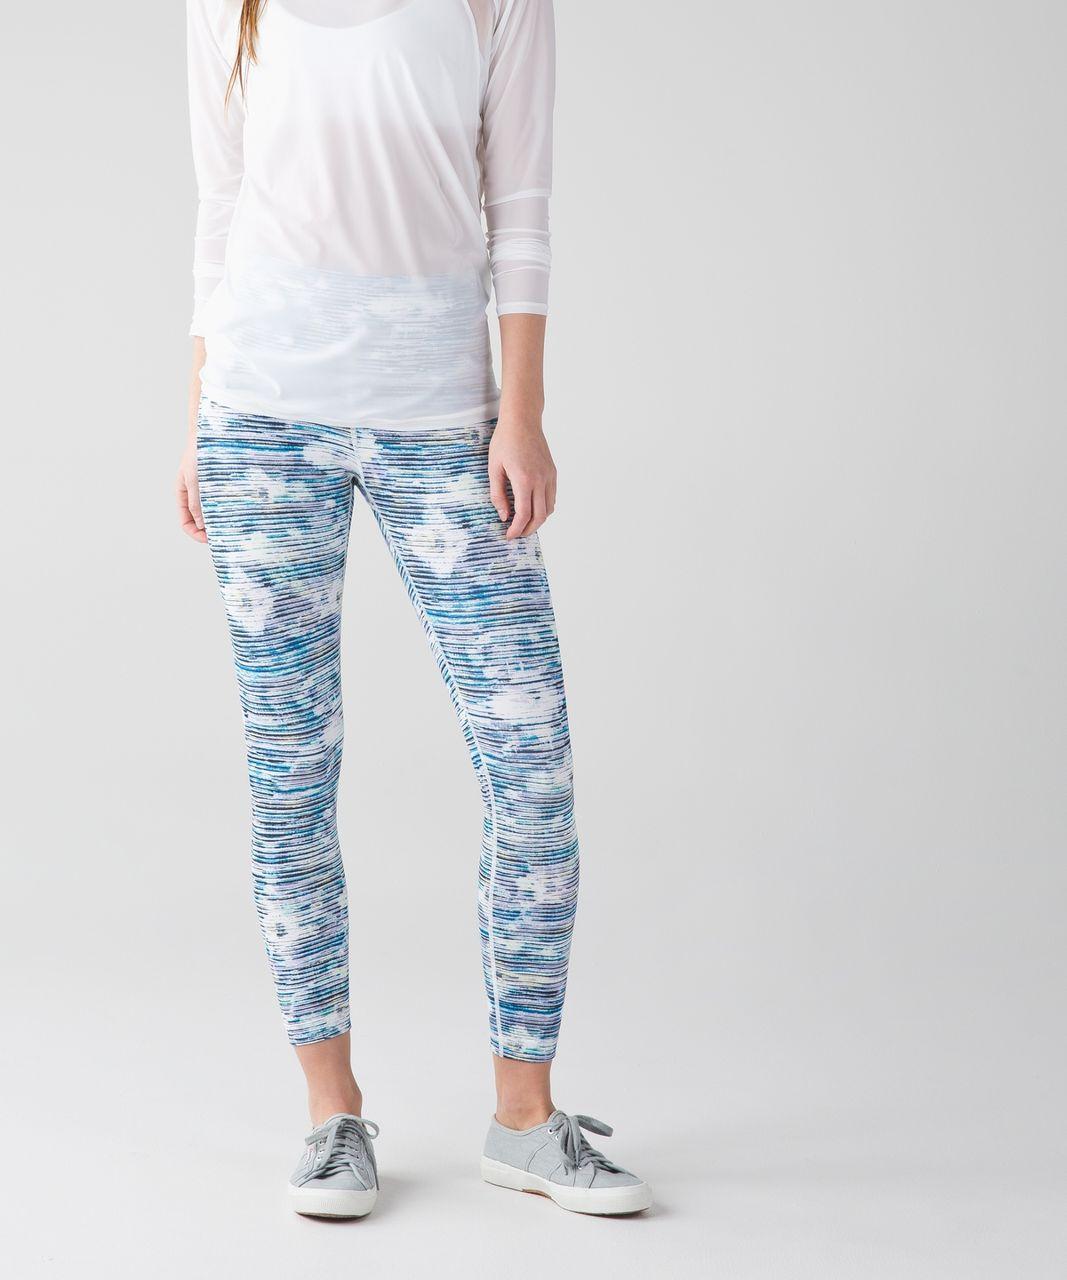 Lululemon High Times Pant *Full-On Luxtreme - Blurry Belle Multi